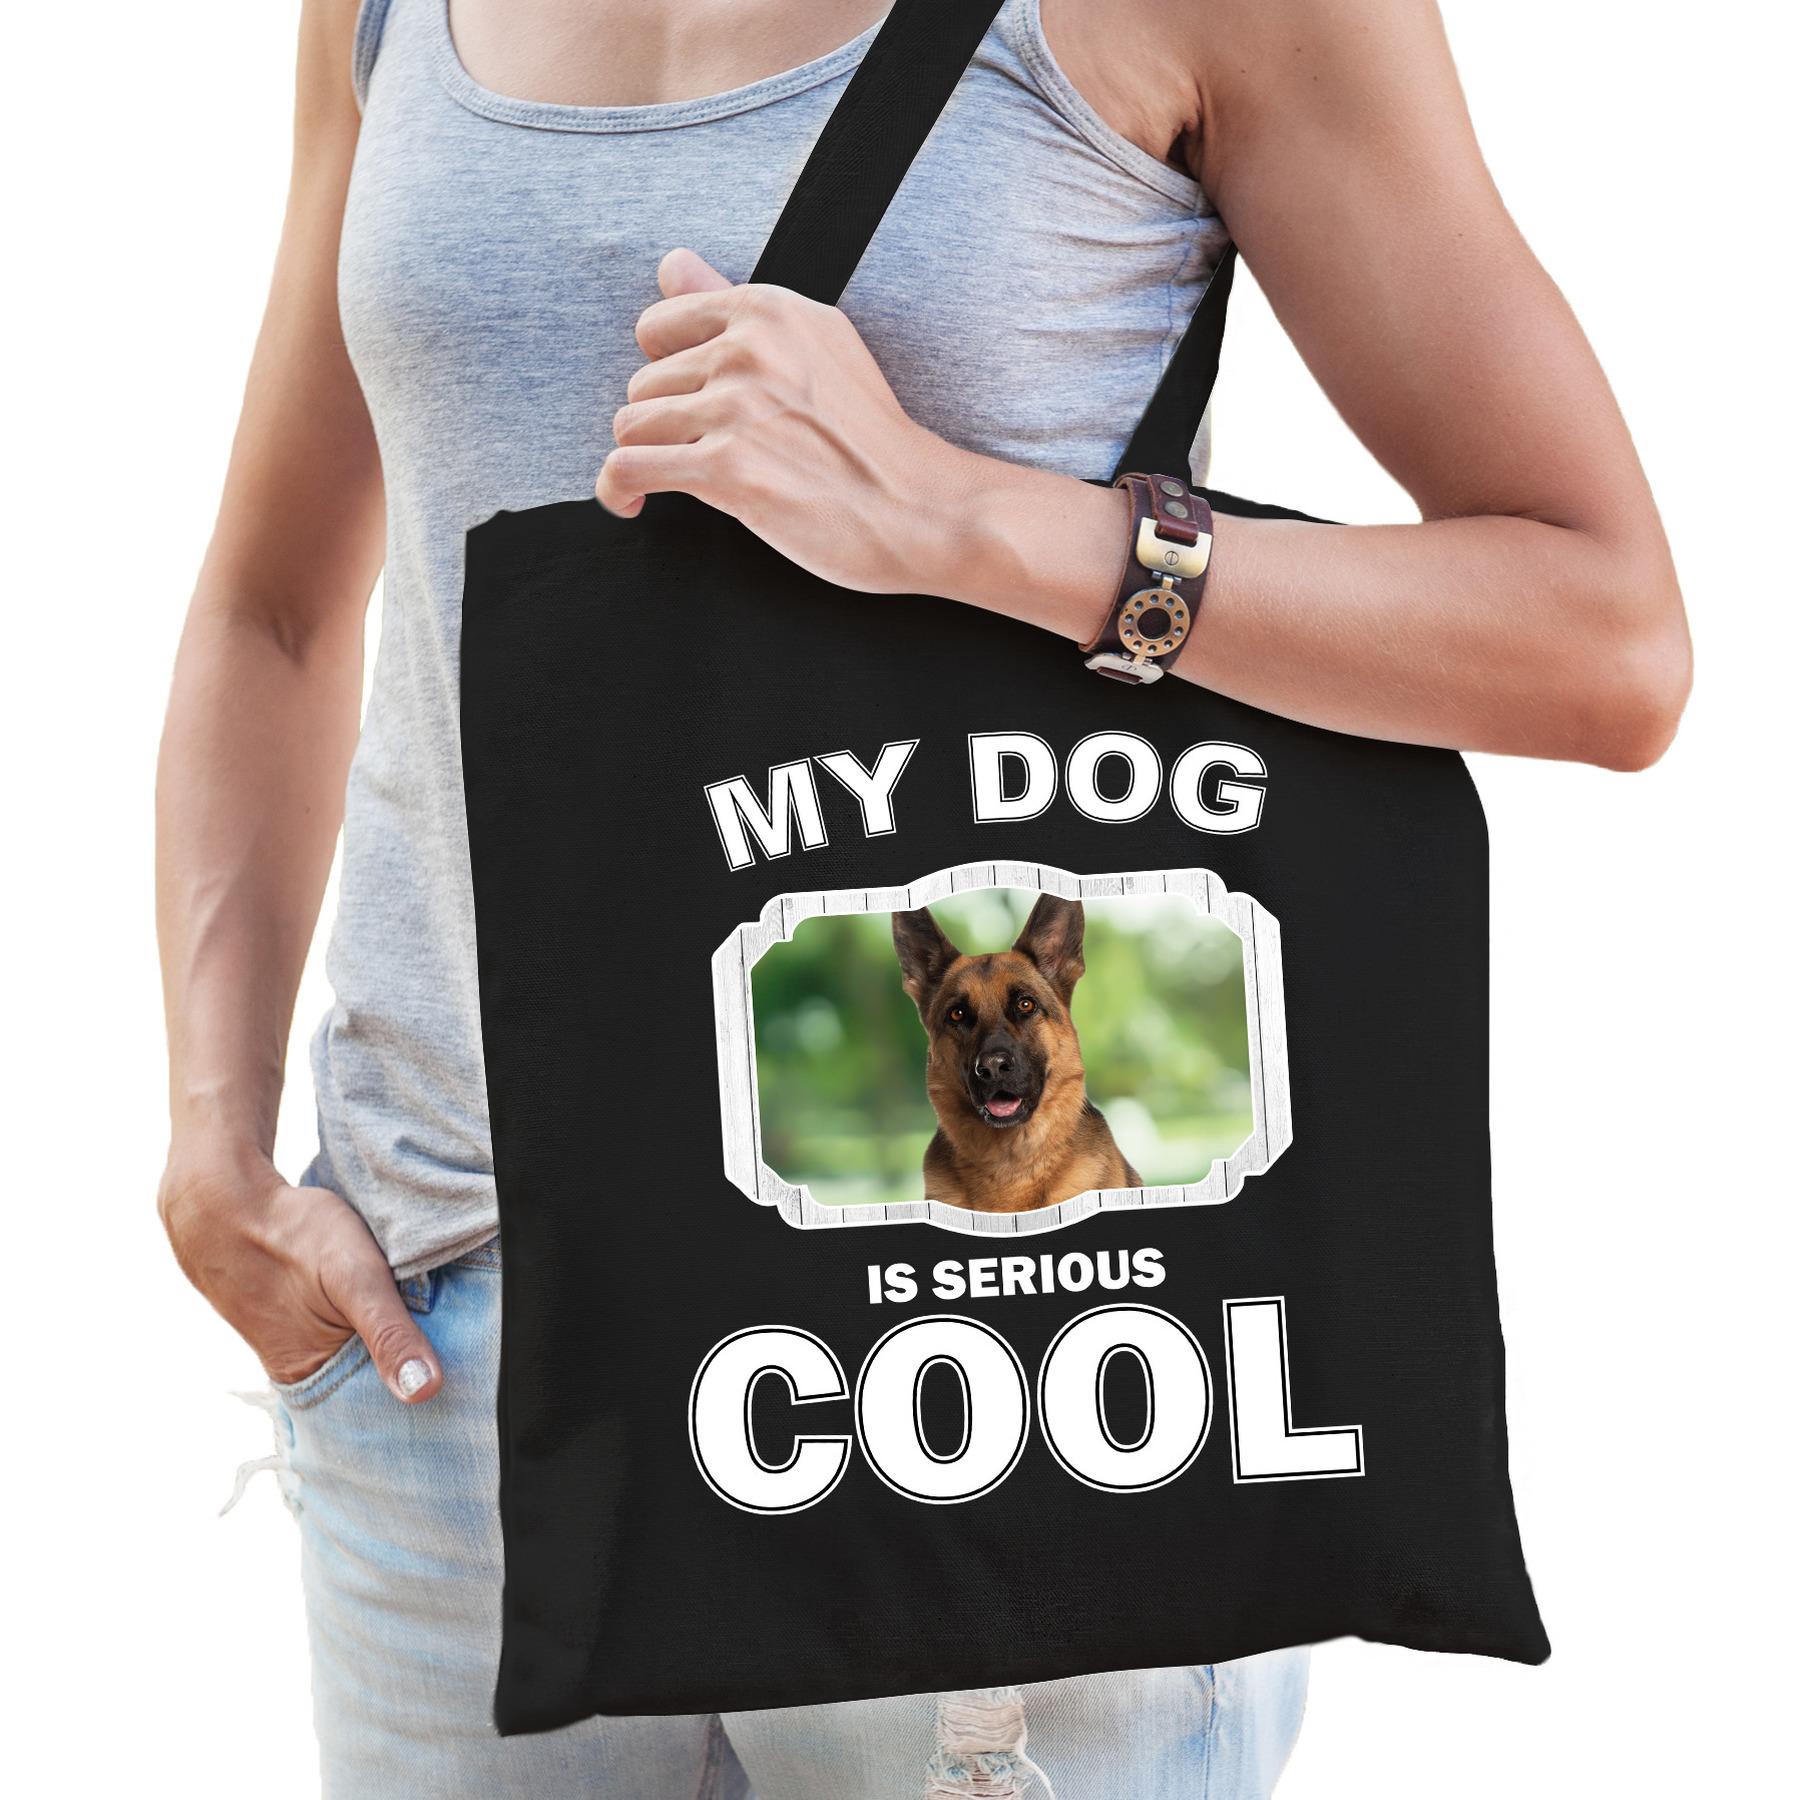 Katoenen tasje my dog is serious cool zwart - Duitse herder honden cadeau tas